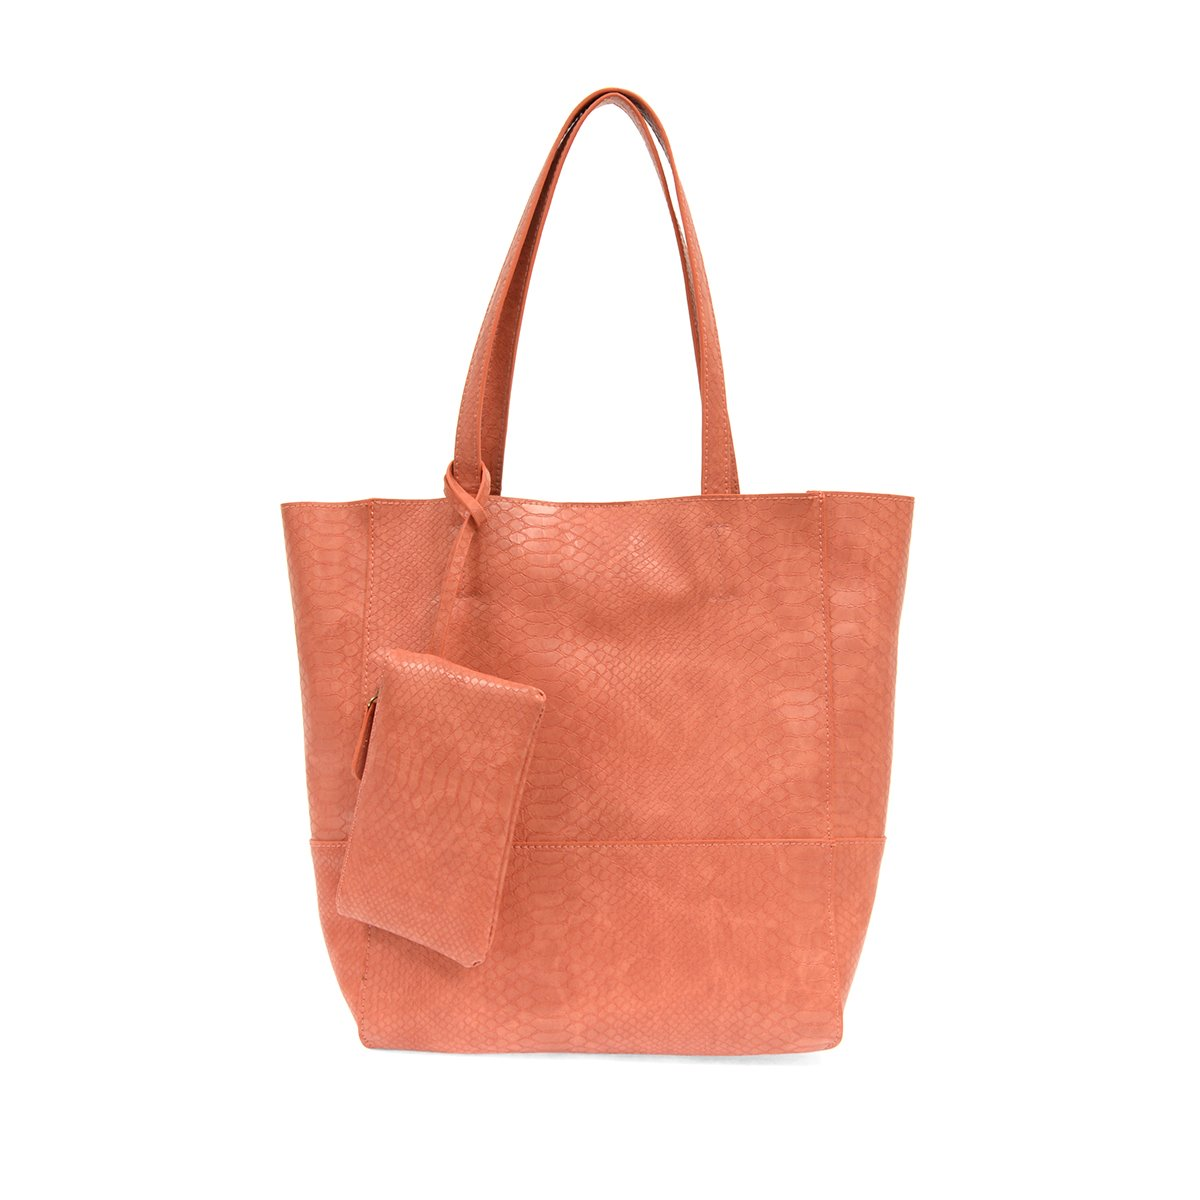 Coral Avery Python Tote Handbag